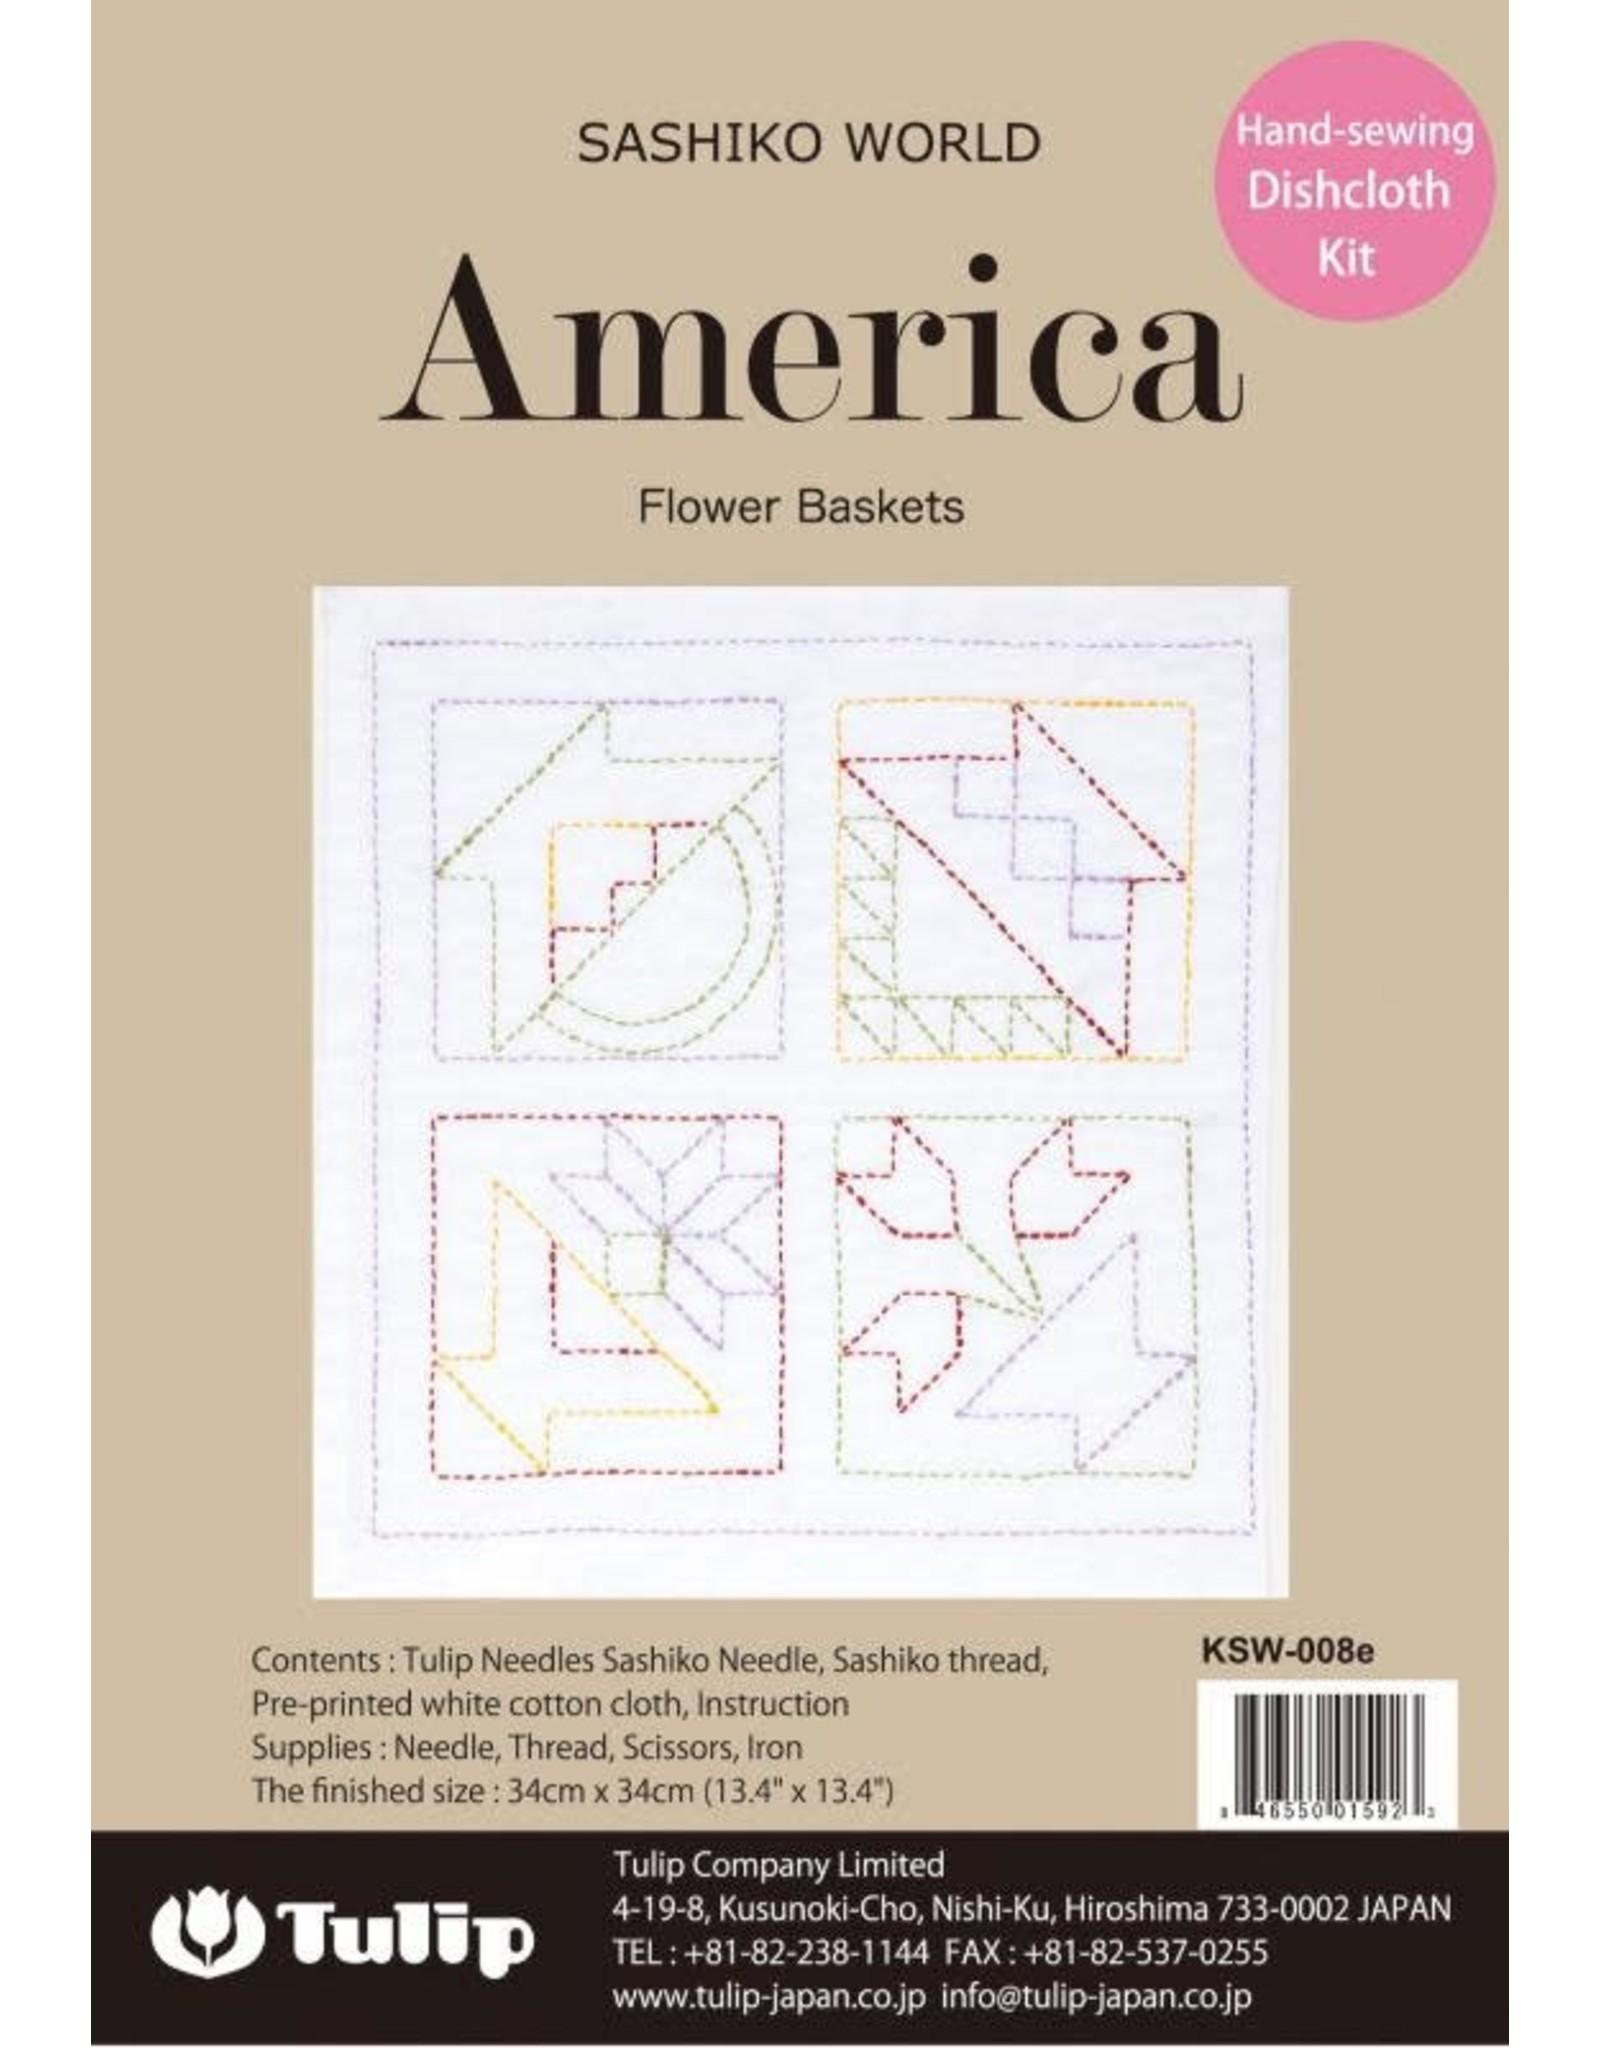 Tulip Sashiko World, America - Flower Baskets, Sashiko Kit, by Tulip